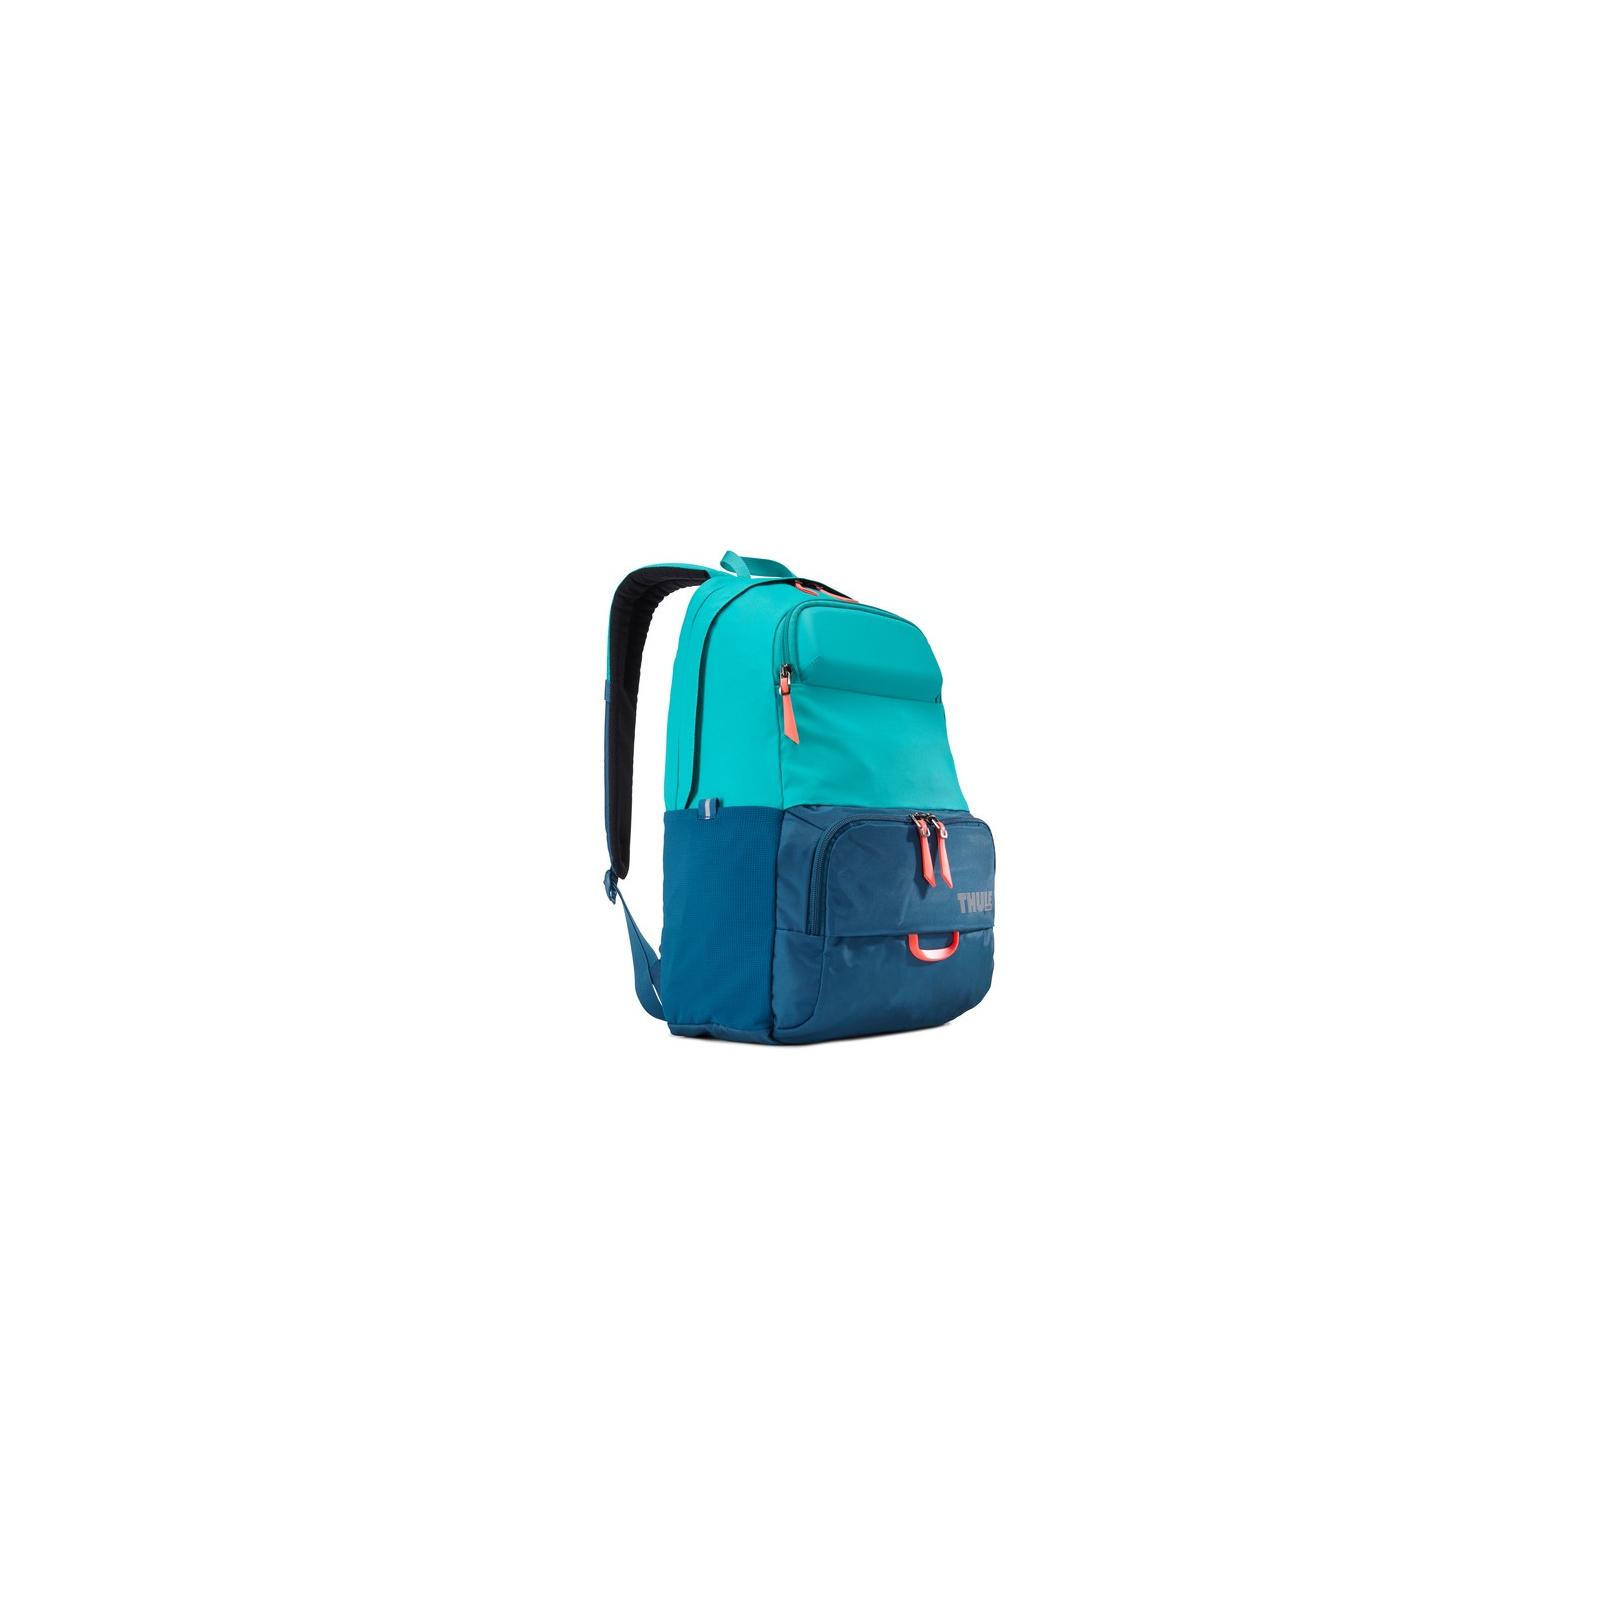 "Рюкзак для ноутбука Thule 15"" Departer 21L Corsair/Bluegrass TDMB-115 (3202905)"